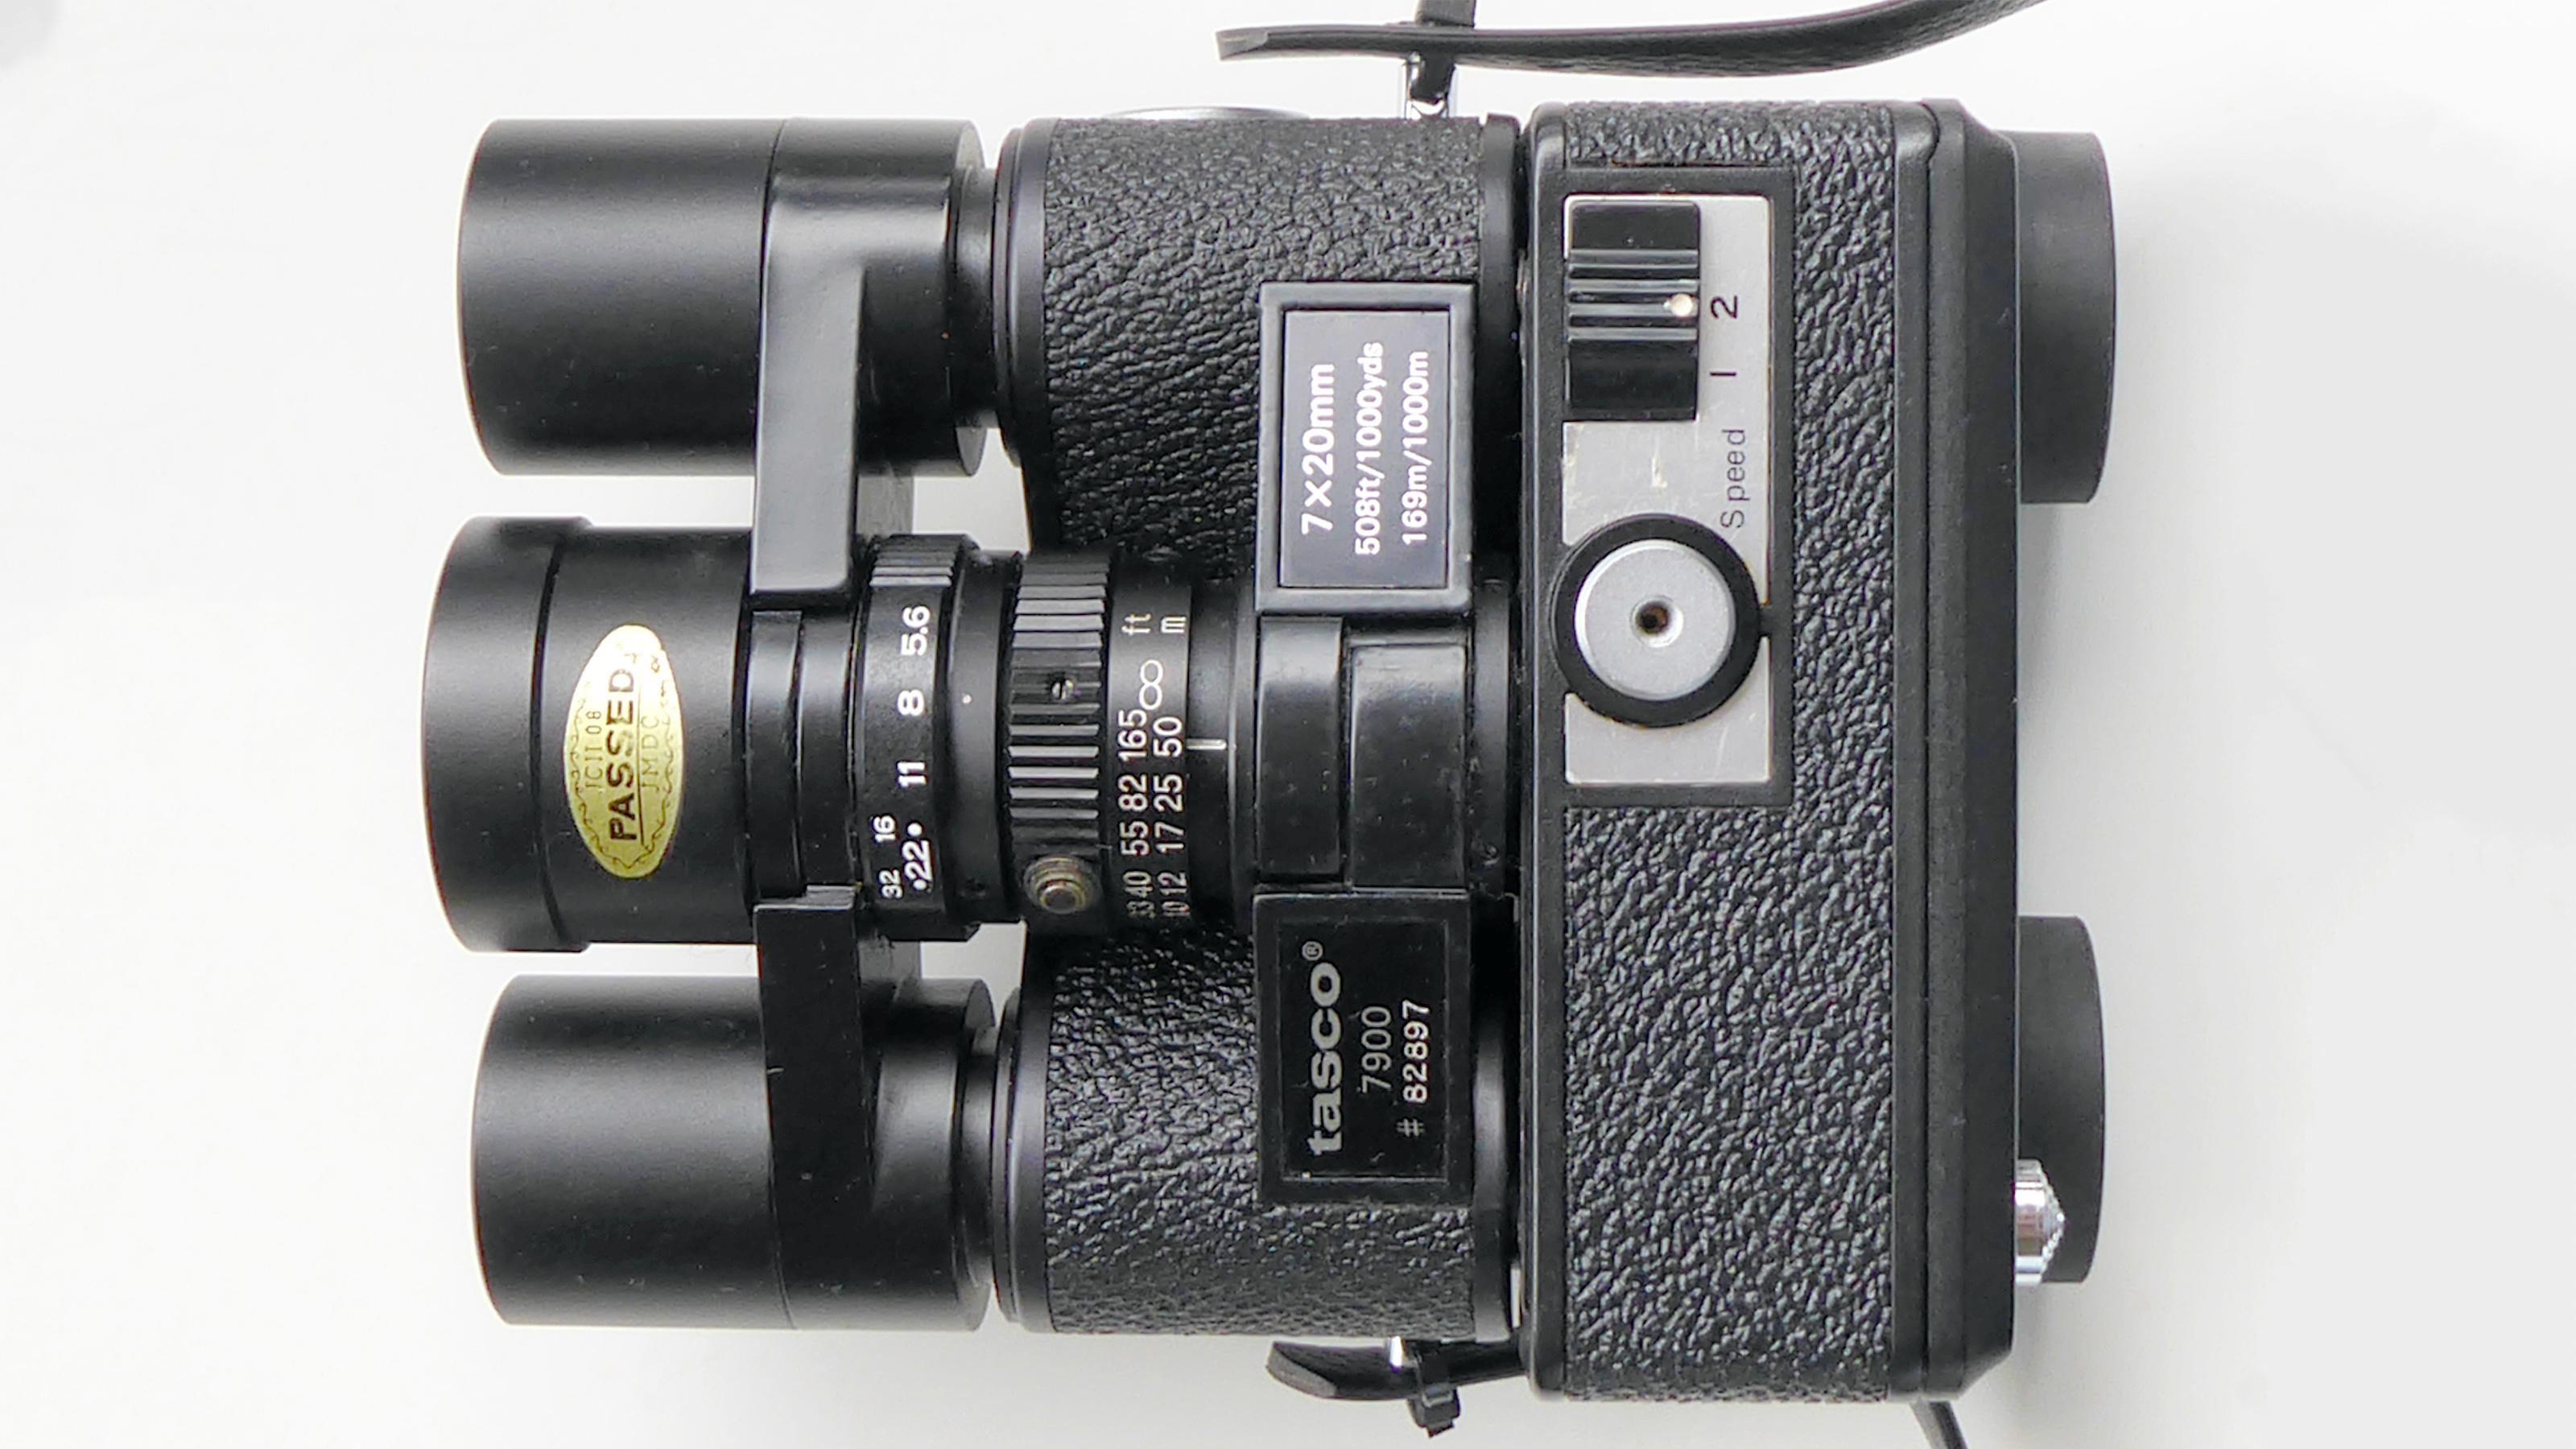 The top of the Tasco 7900 binocular camera